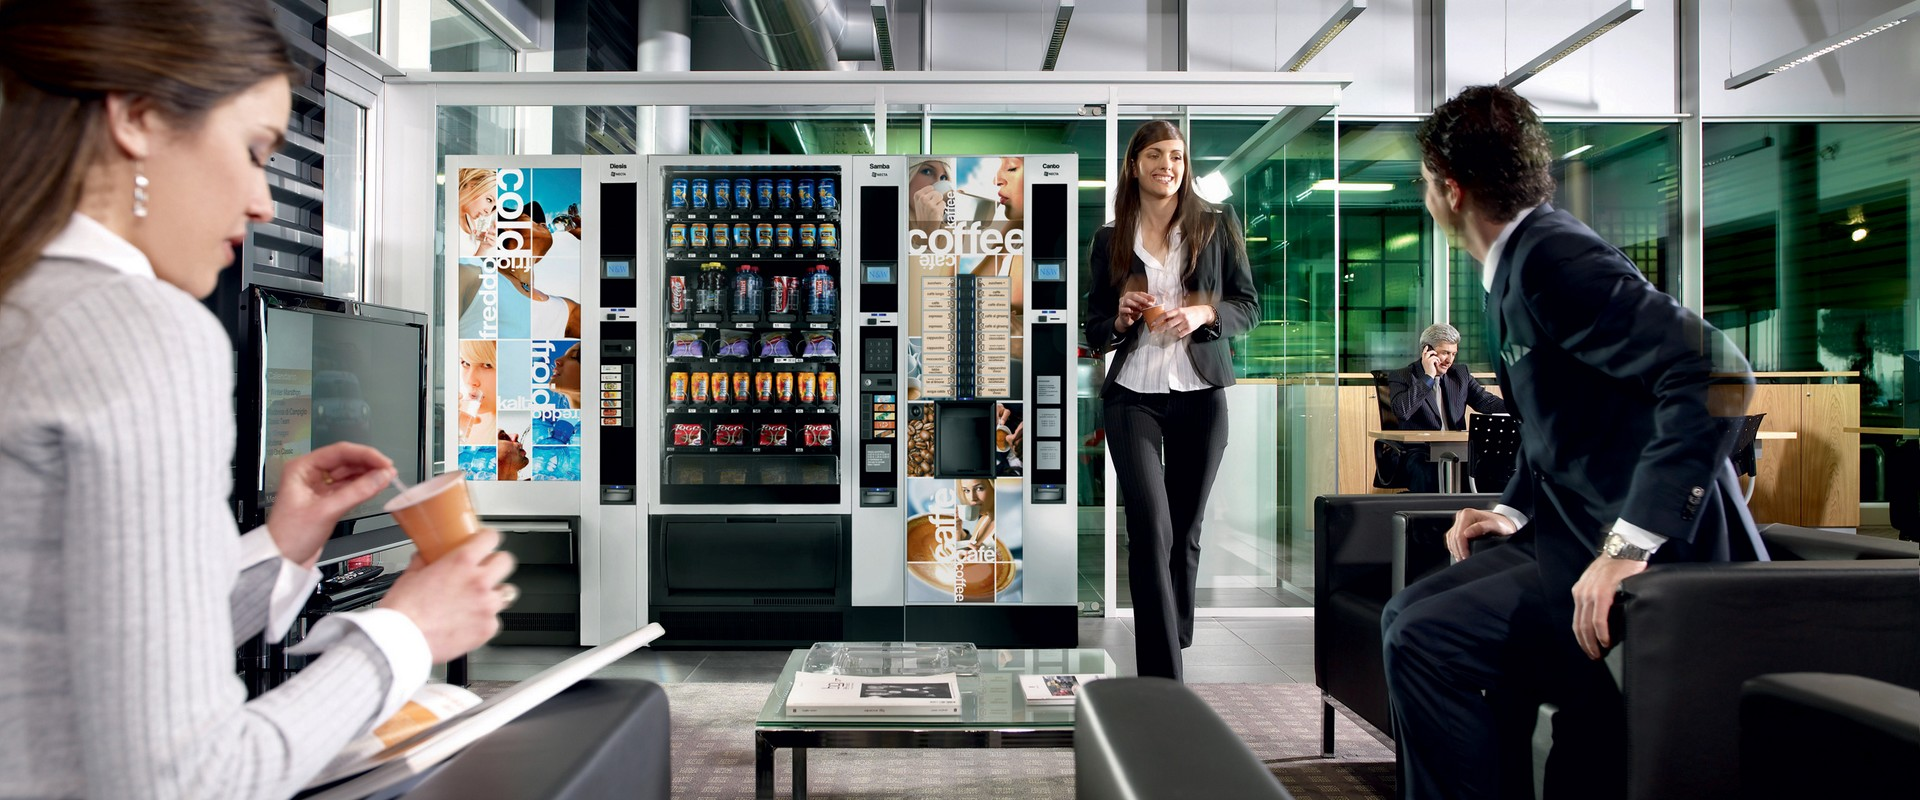 Automate distributeur ADIS